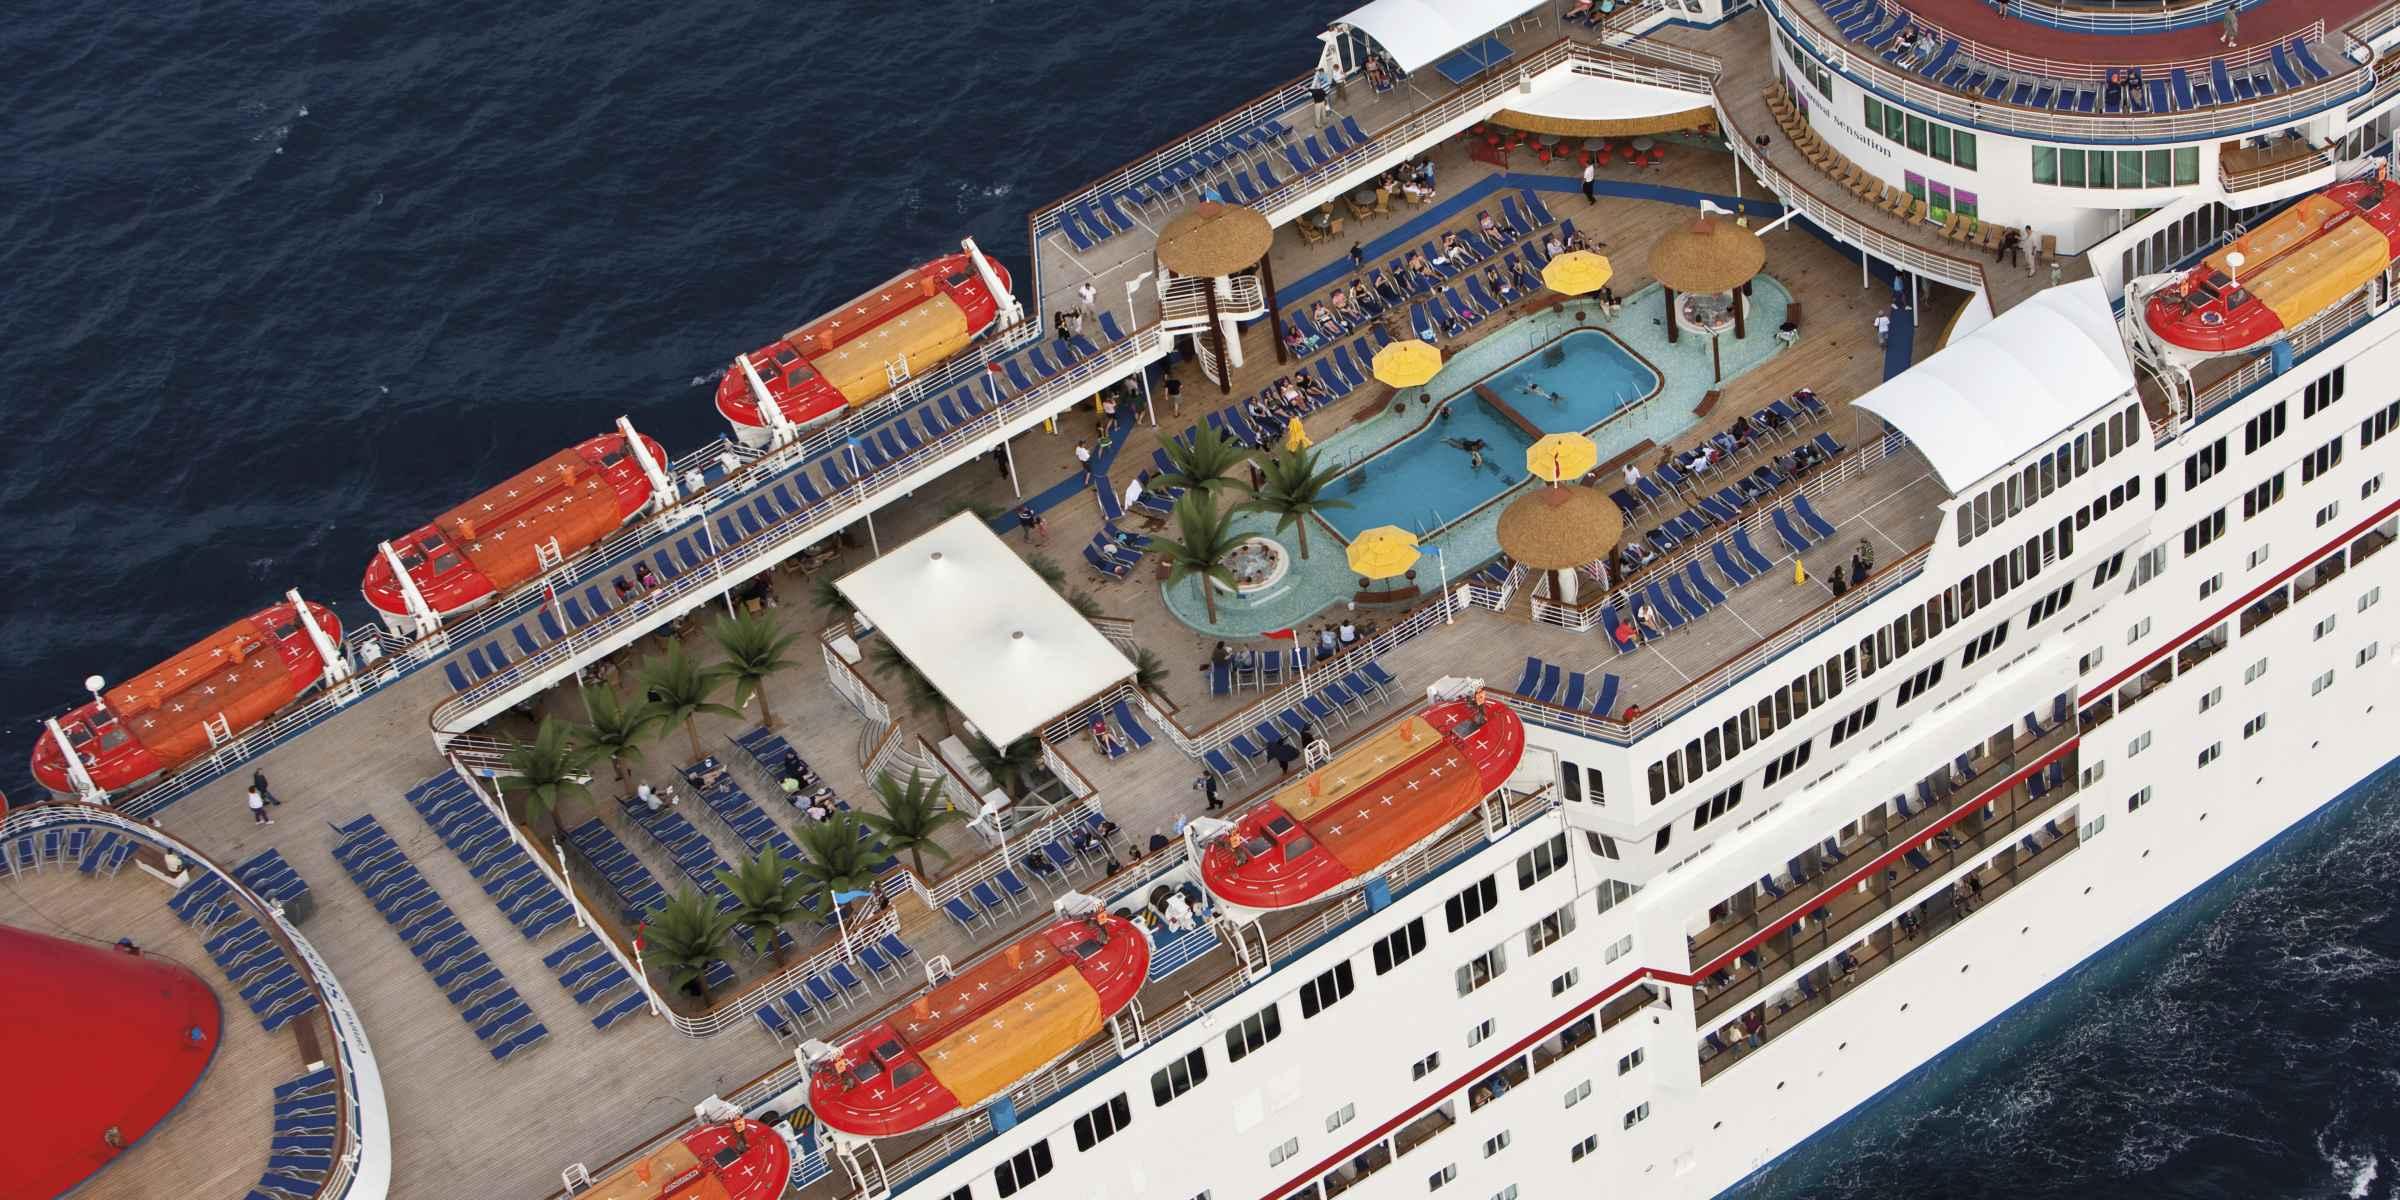 Sensational Carnival Cruises Cruise Deals On Carnival Sensation Ibusinesslaw Wood Chair Design Ideas Ibusinesslaworg